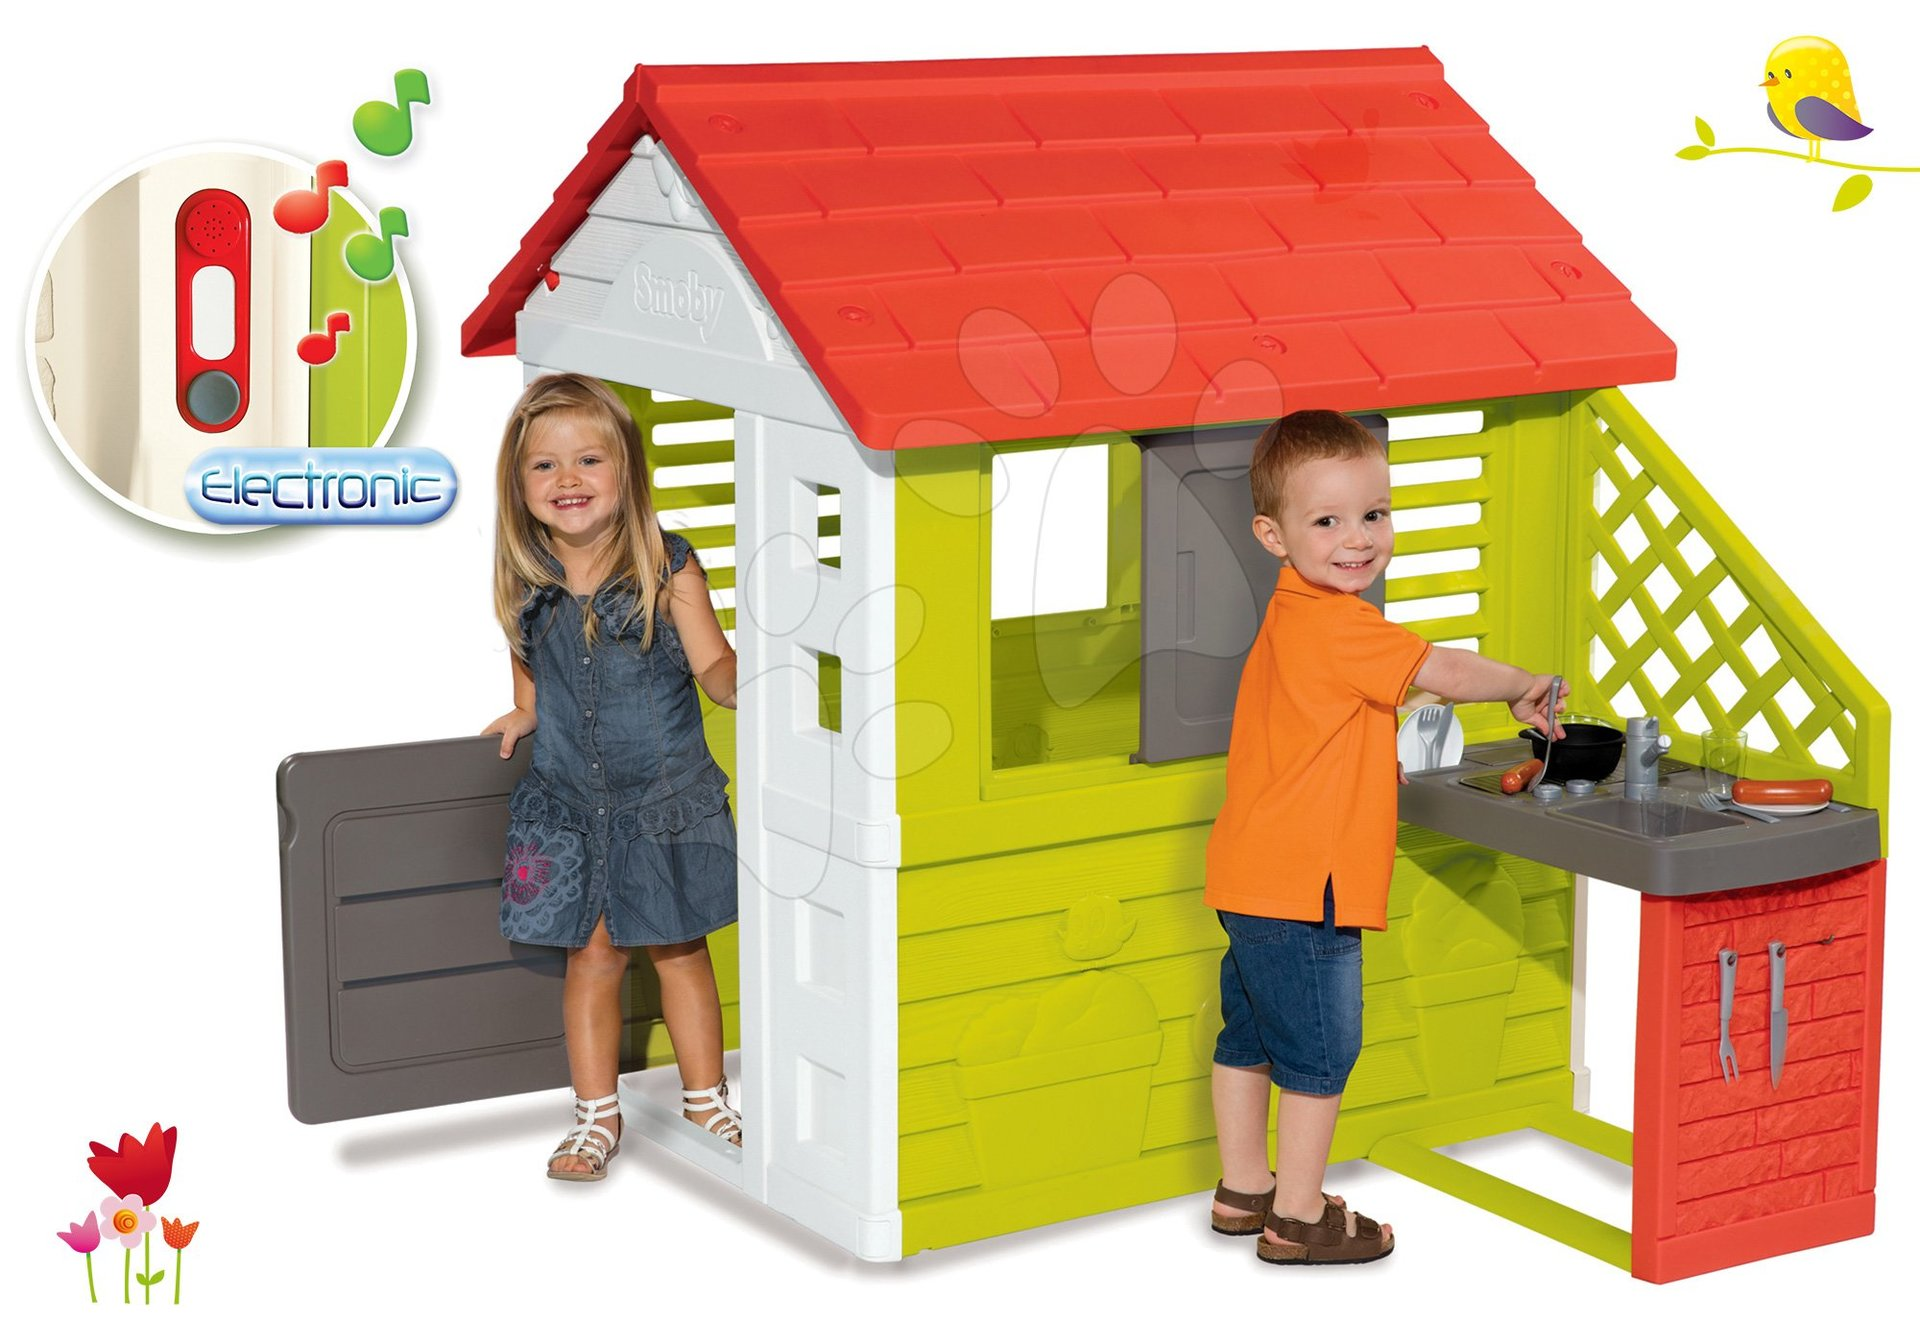 Smoby set domček Pretty Nature s letnou kuchynkou a okenicou a darček zvonček elektronický 810702-30